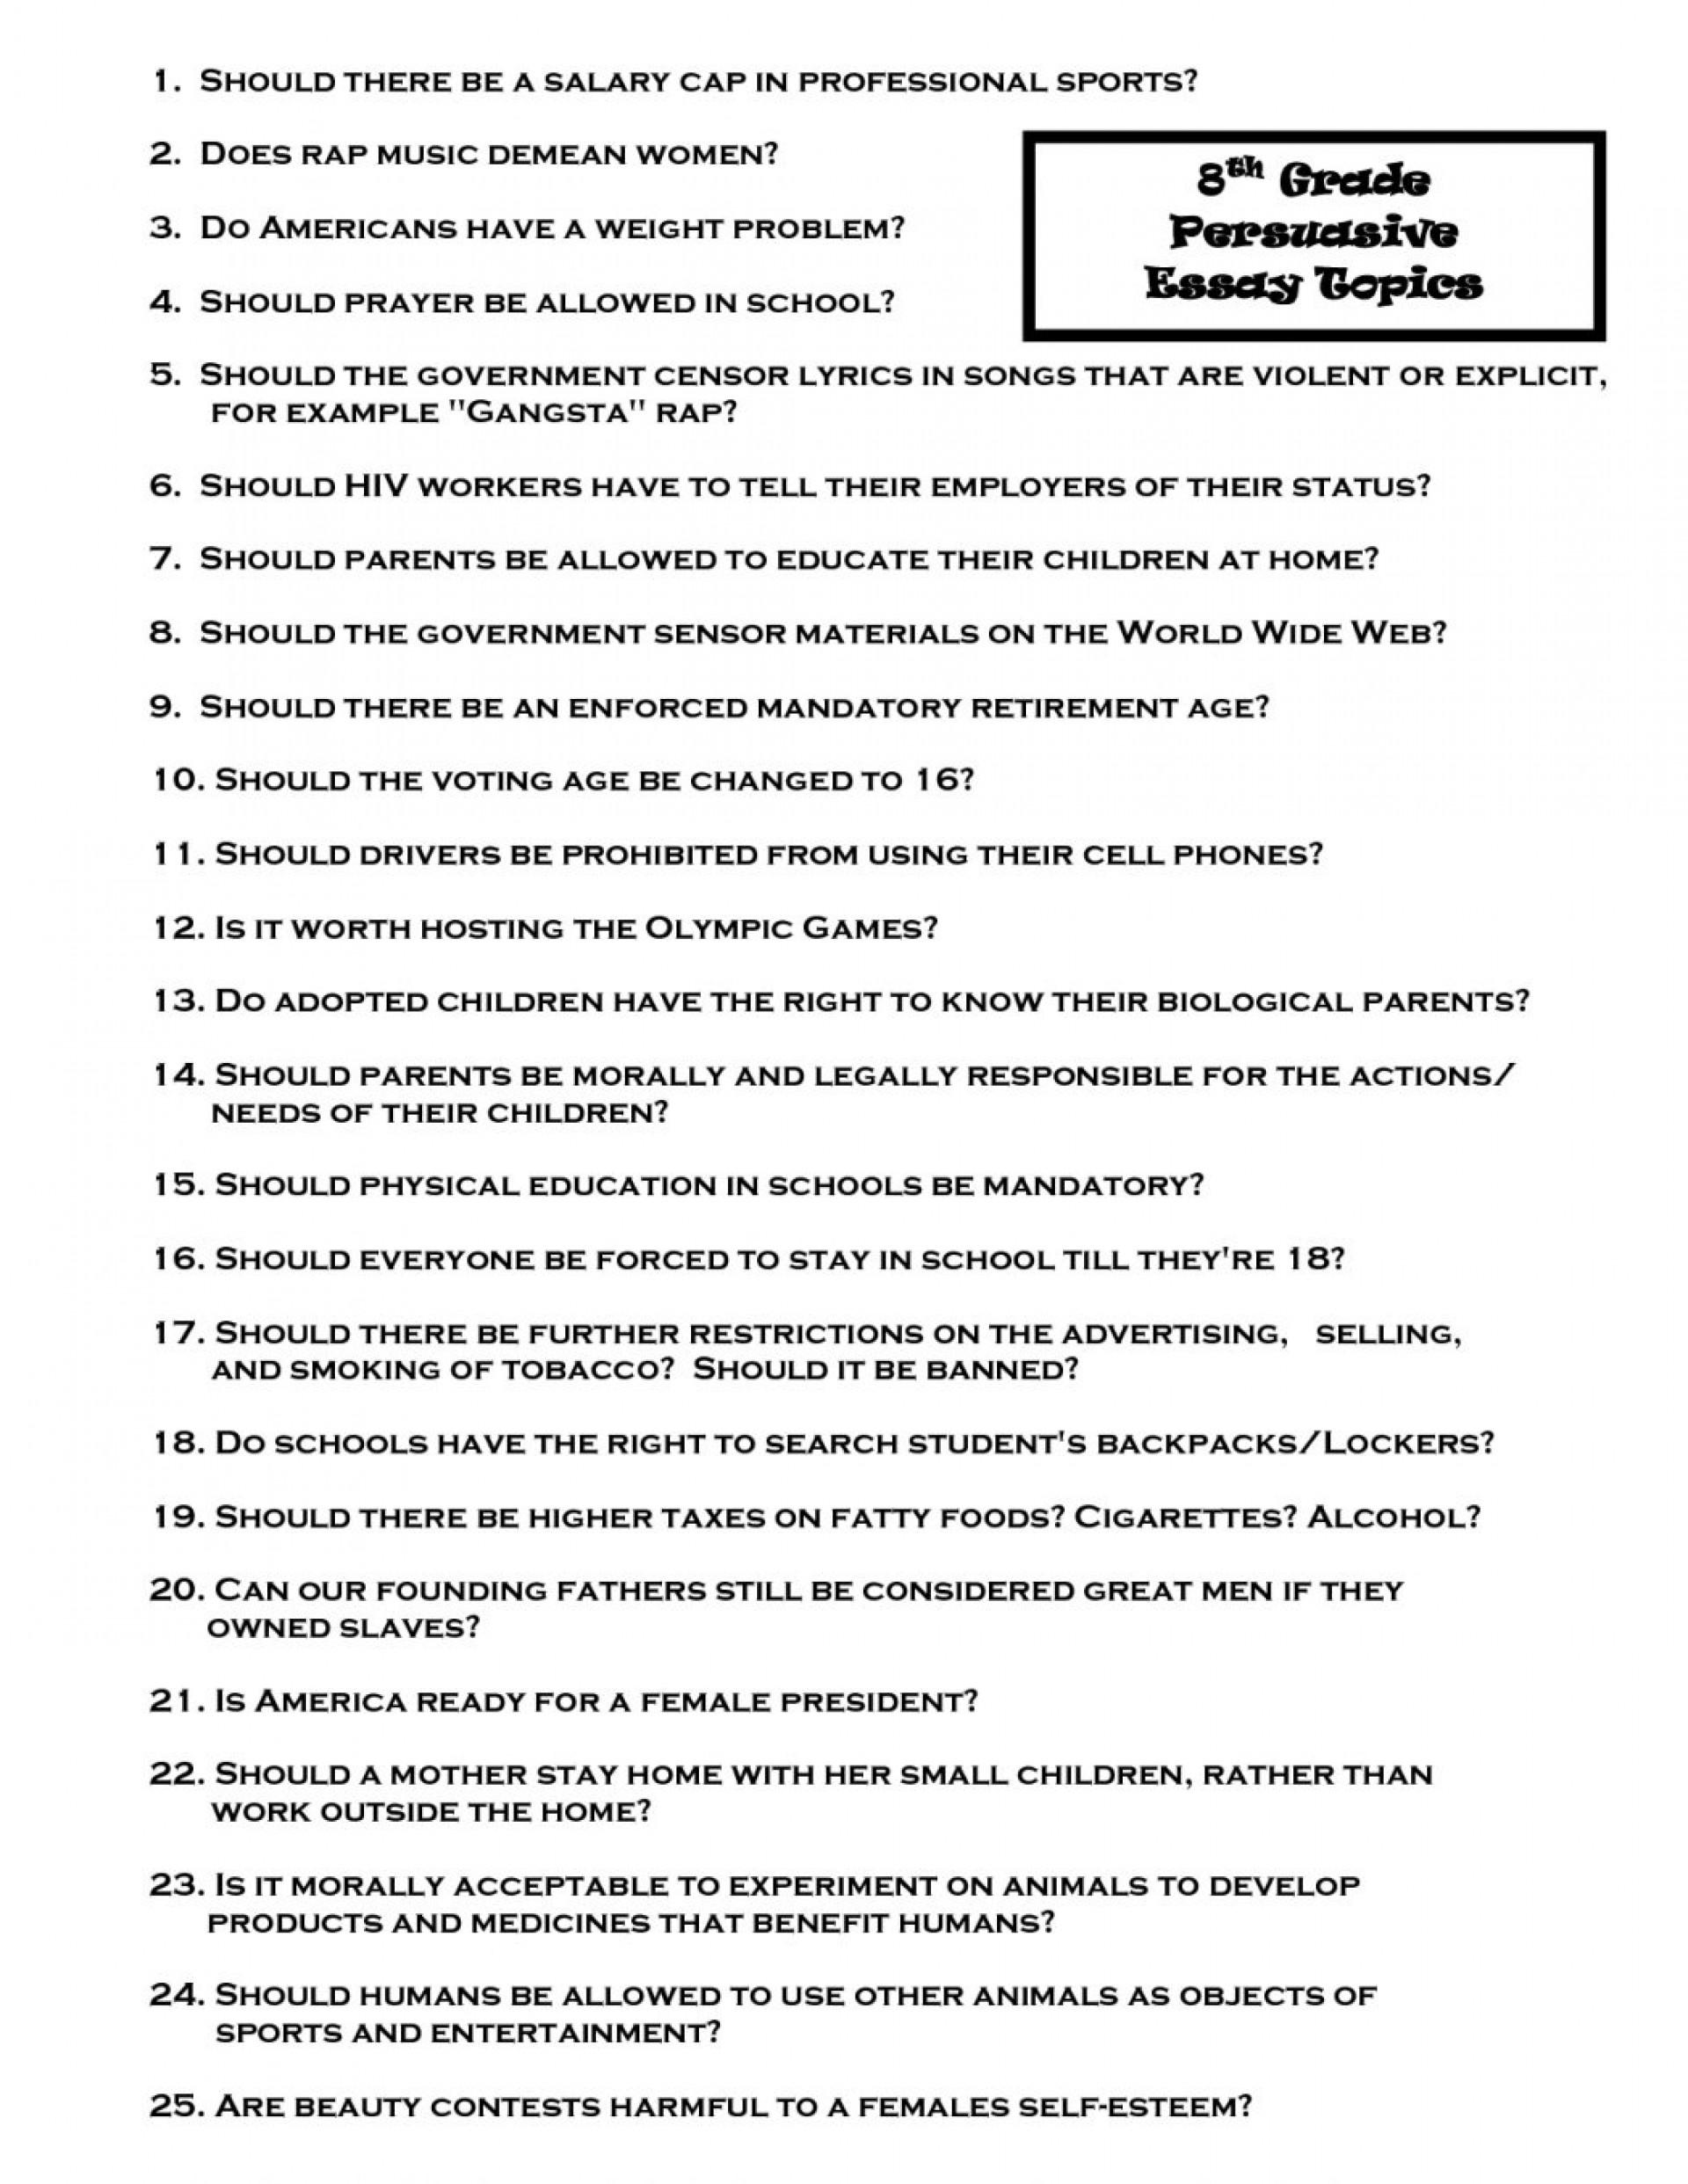 004 essay example ideas for argumentative